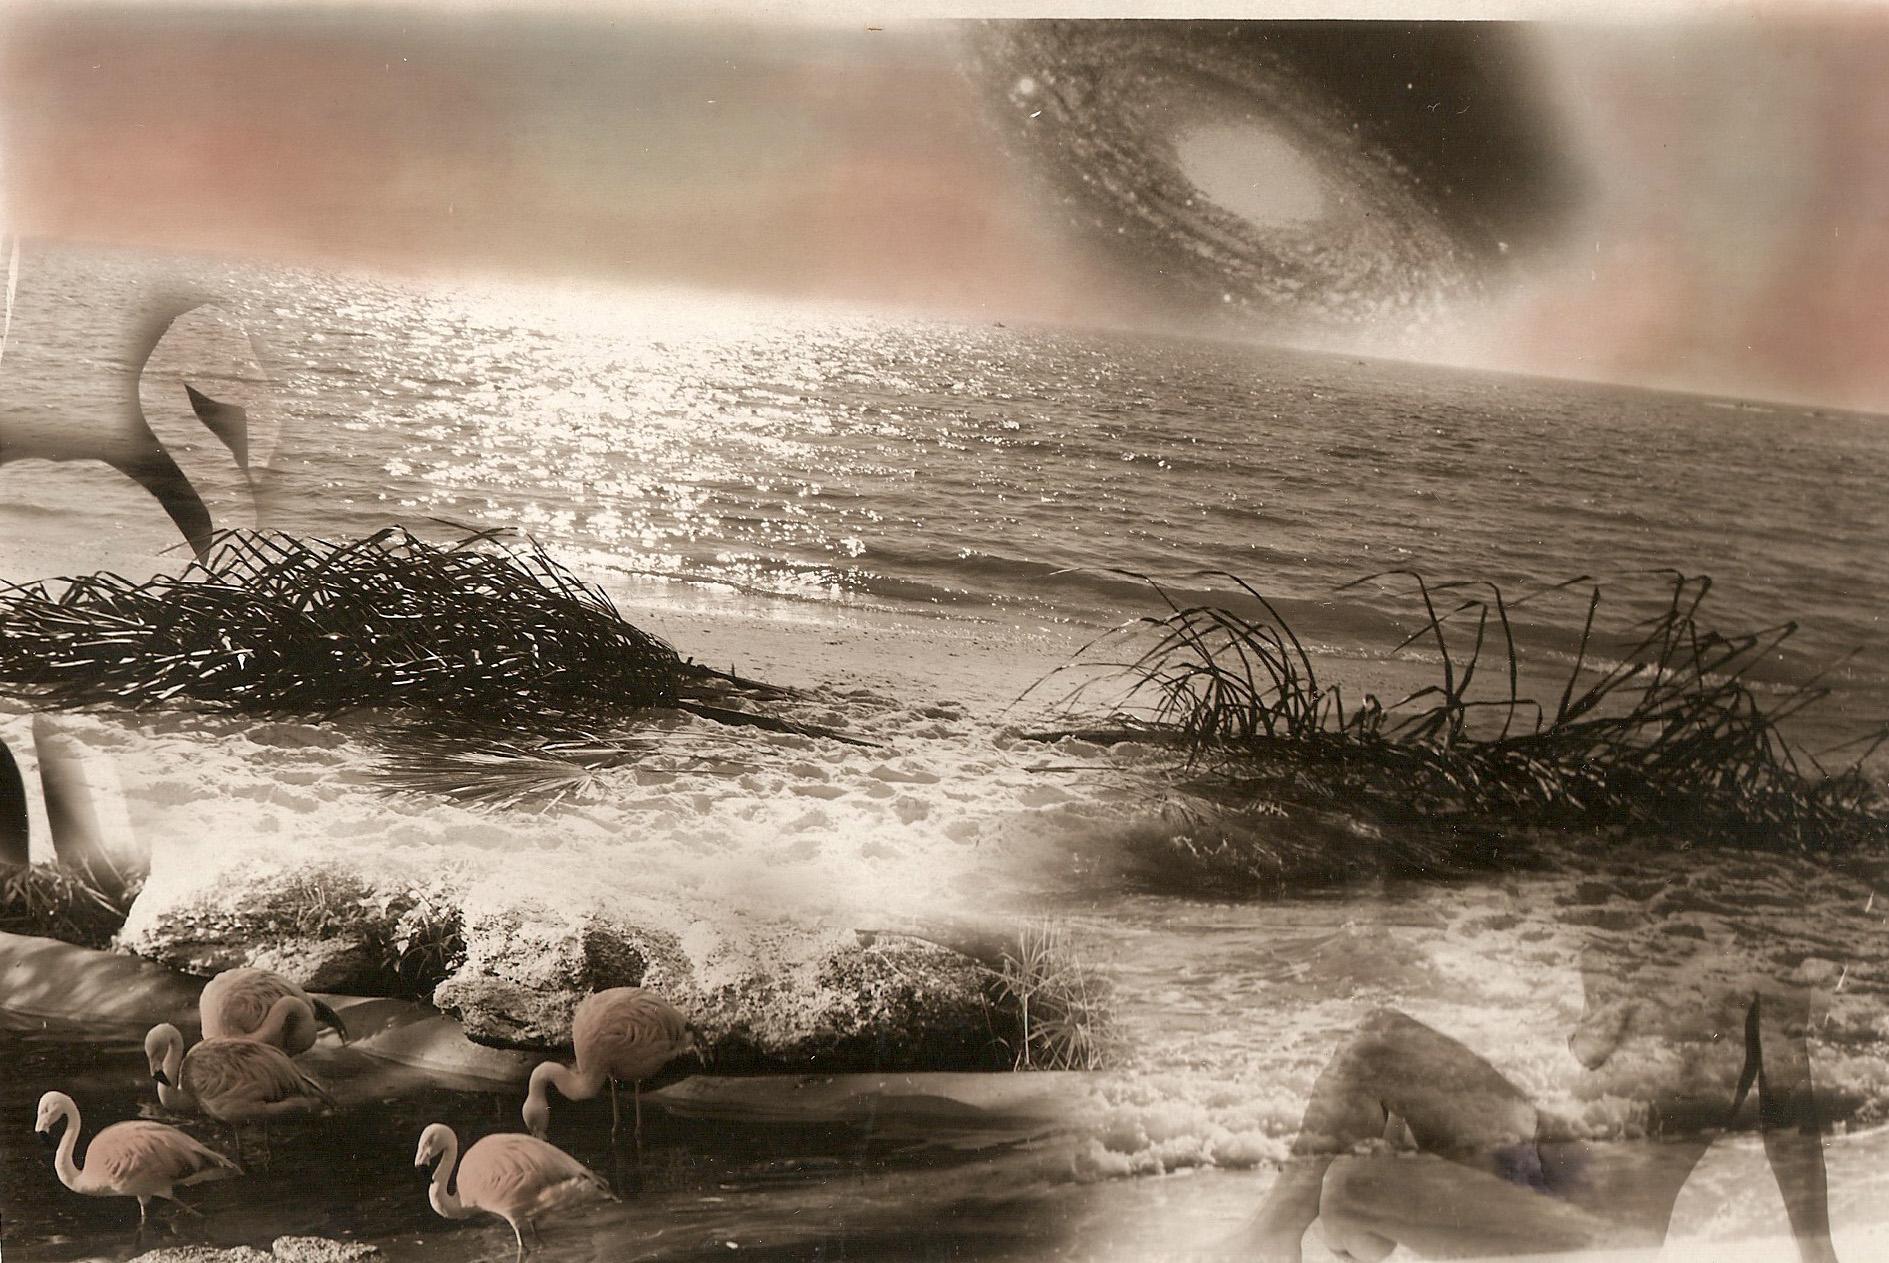 Star Consulation The Sea & Figure Flamingo 5x7 in 300 dpi.jpg